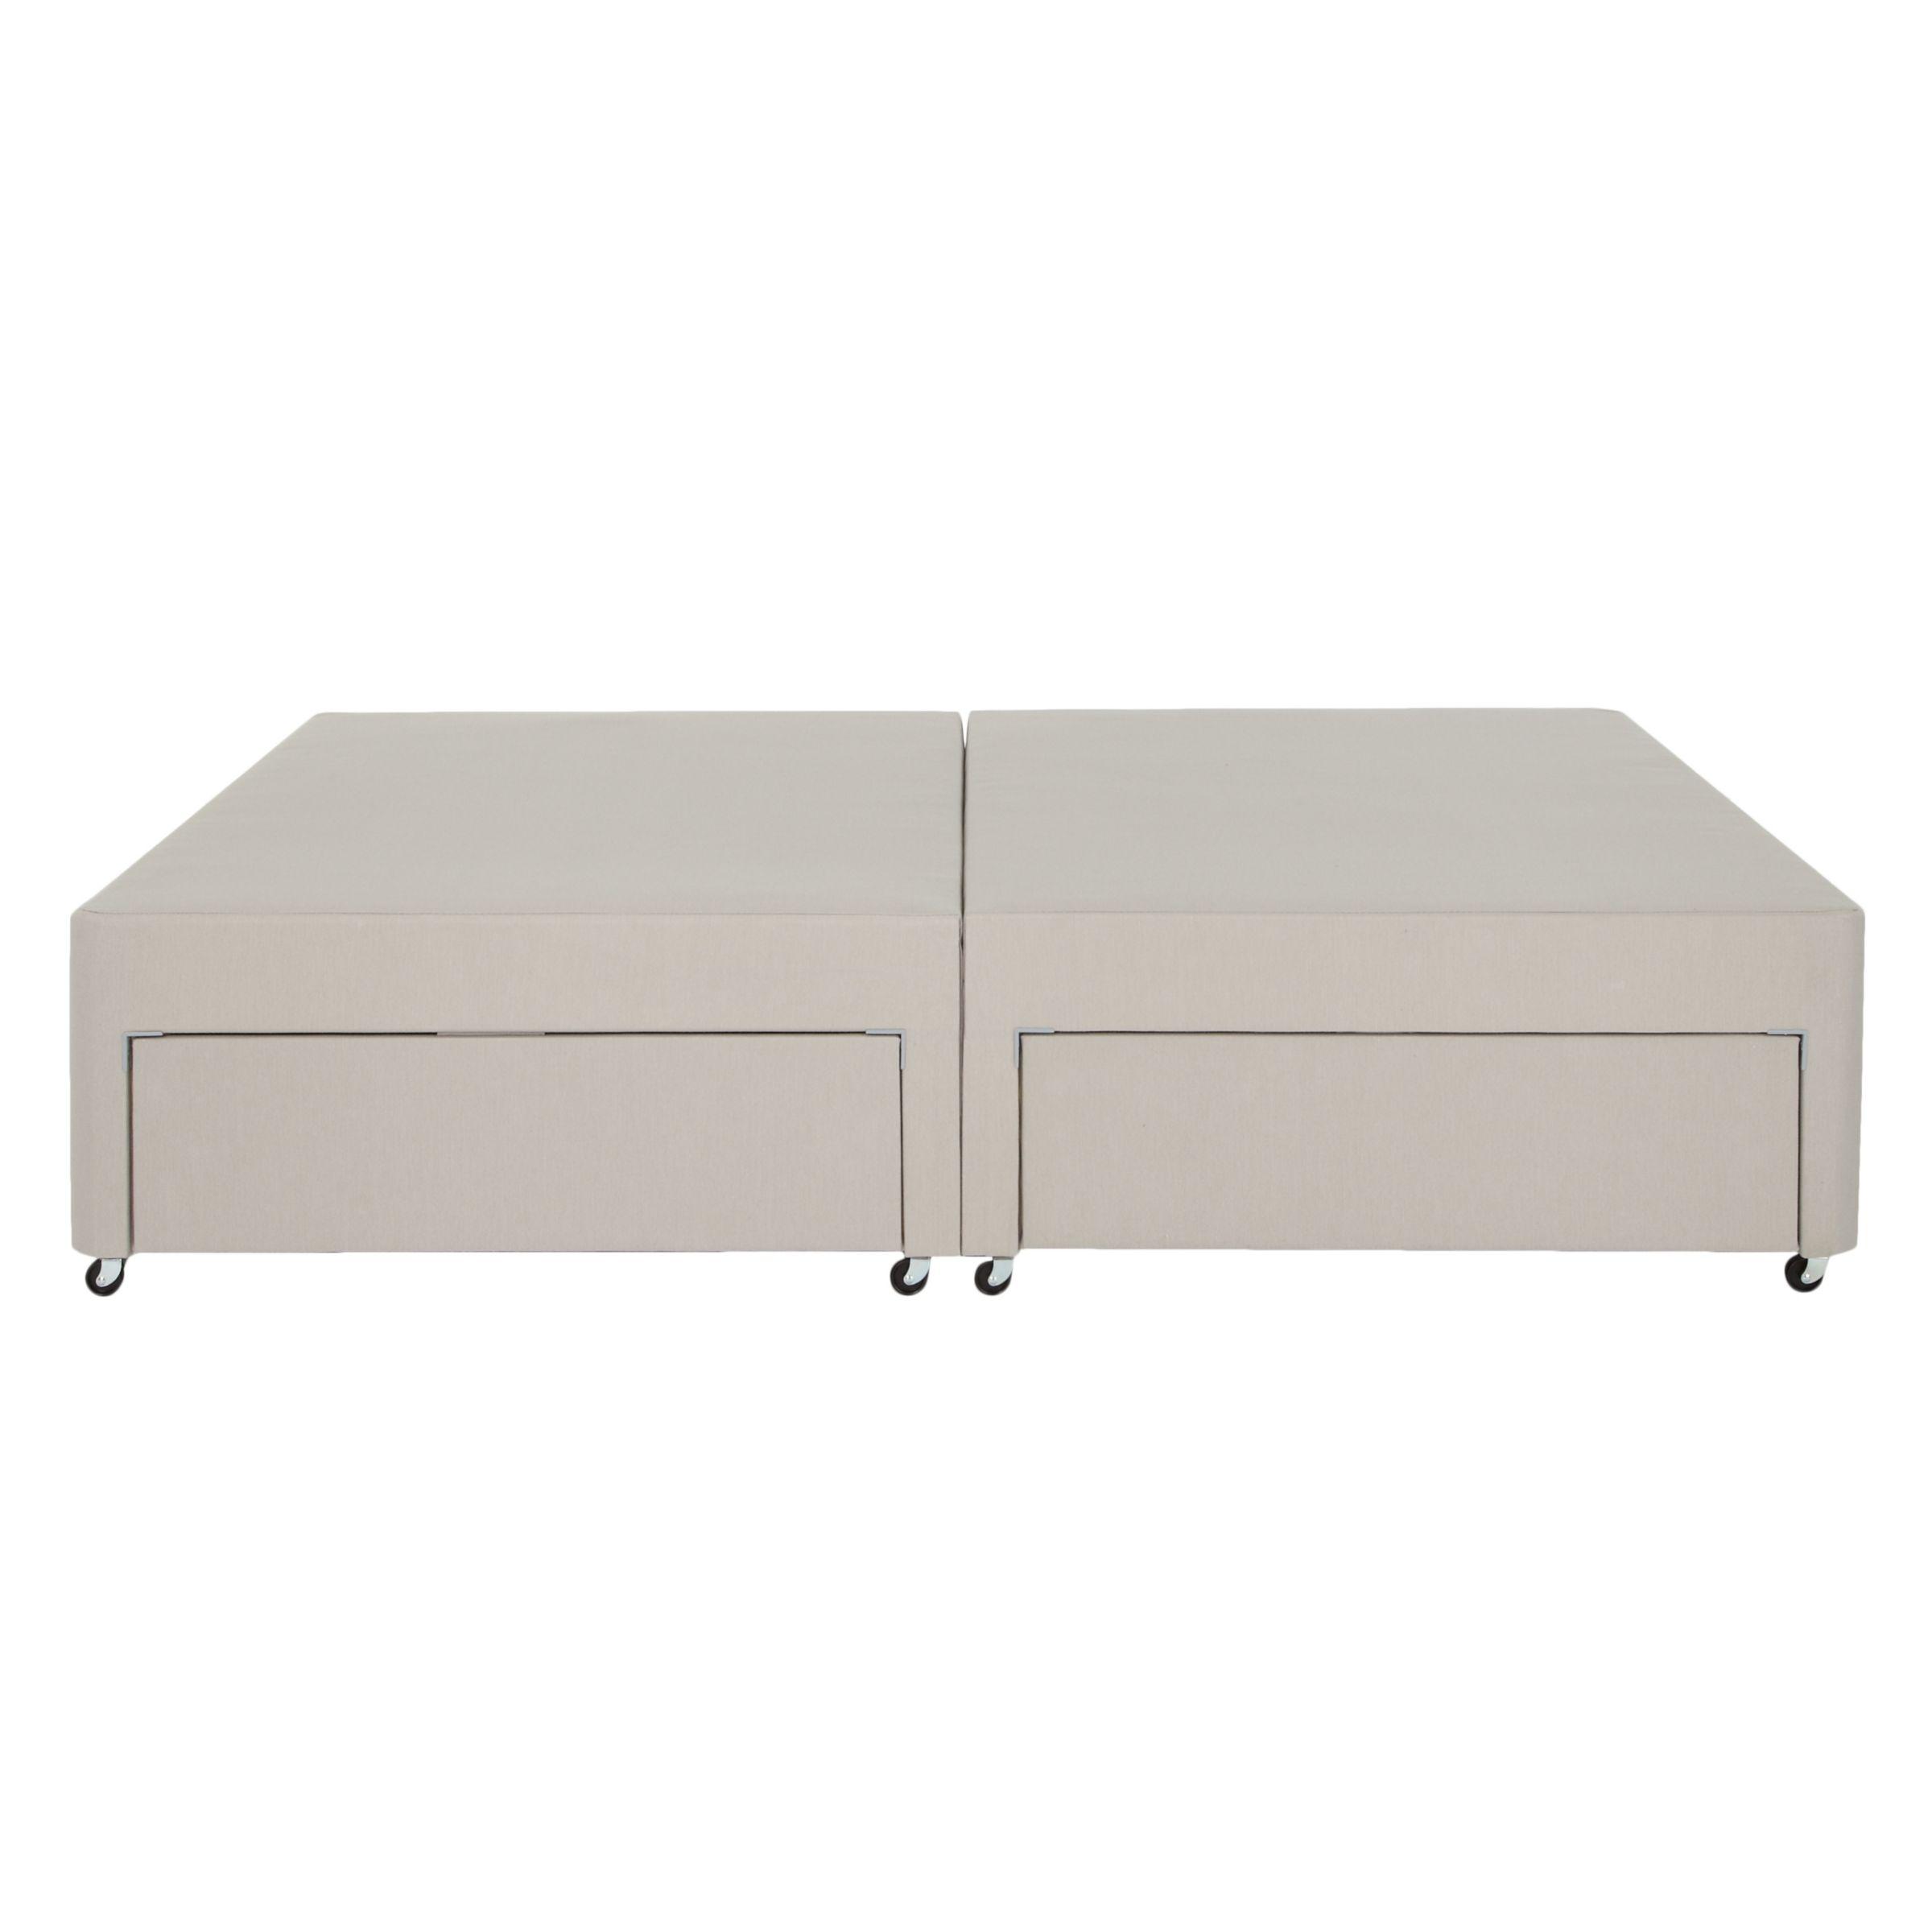 John Lewis Partners Non Sprung Four Drawer Divan Storage Bed Light Grey King Size